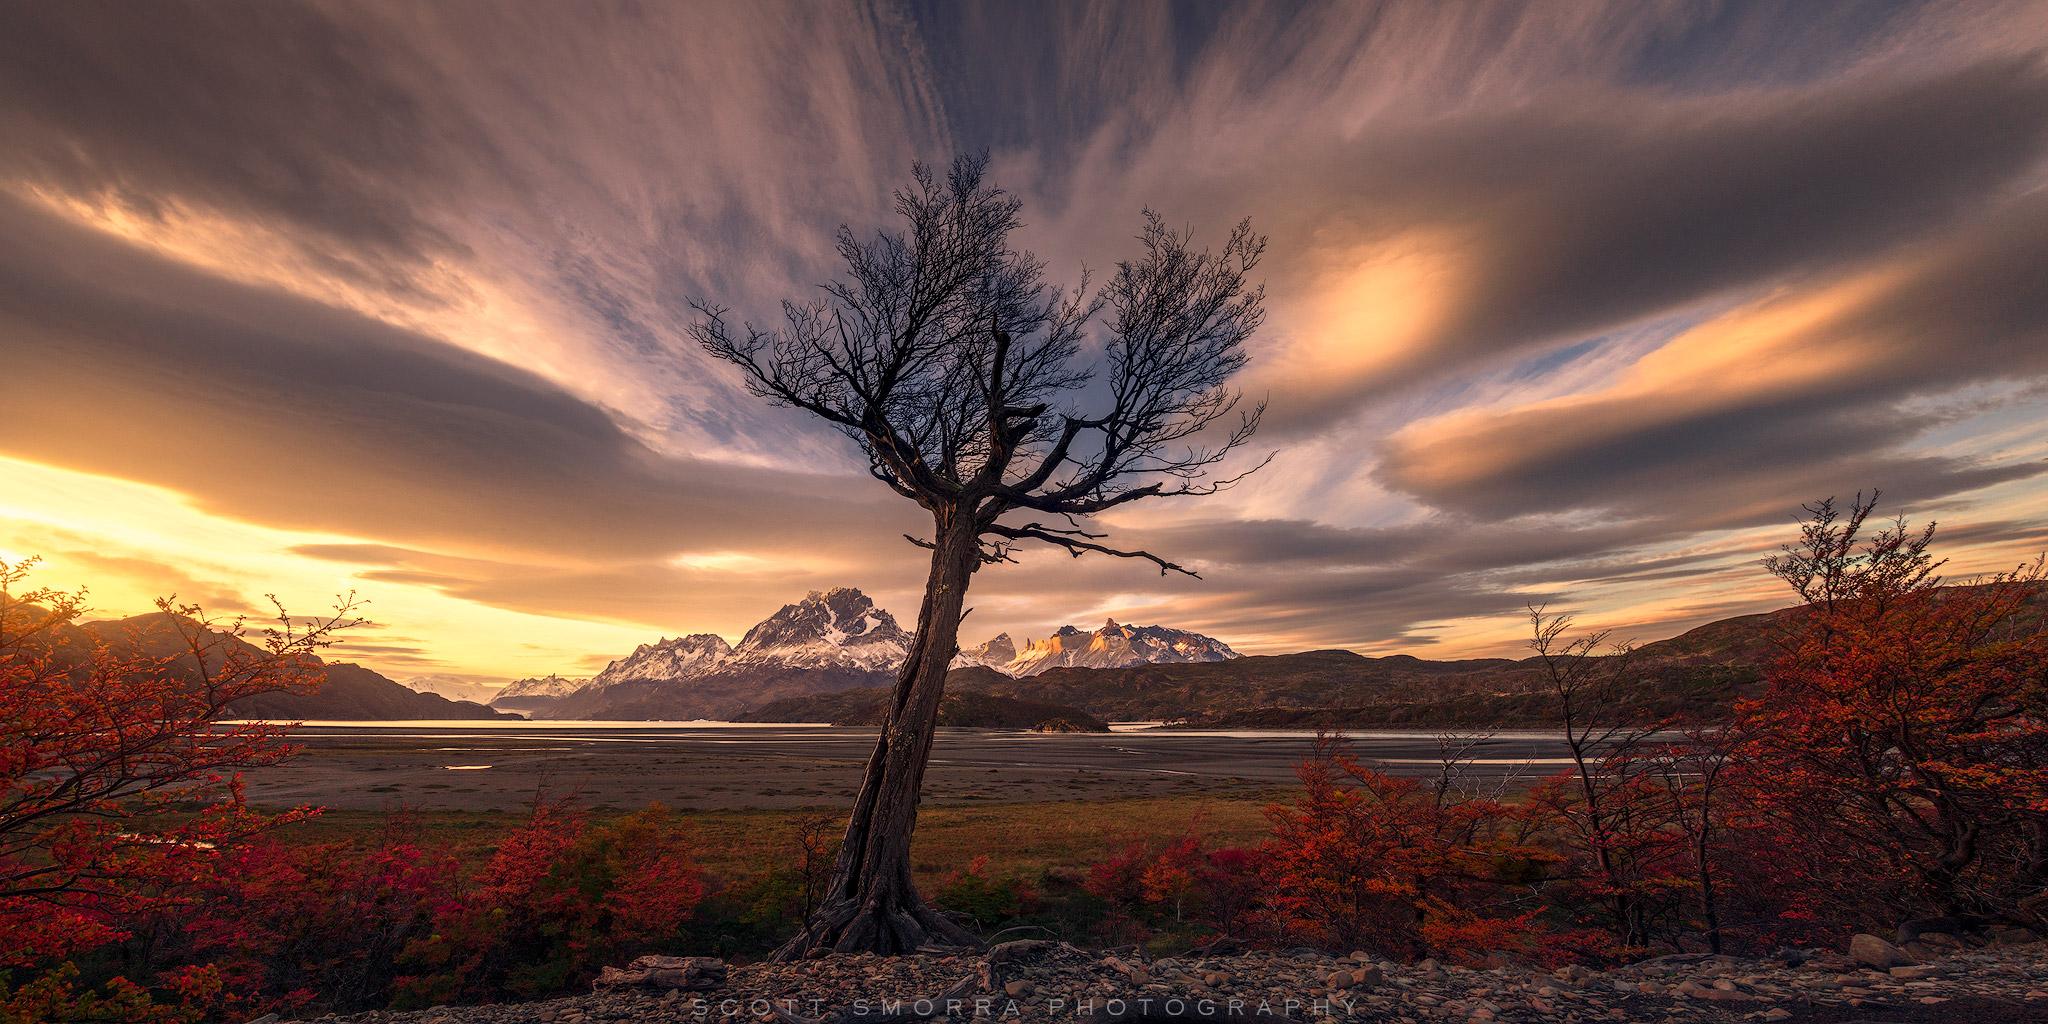 Patagonia, Chile, Parque Nacional Torres del Paine, lenga, tree, solitary, sunset, photo